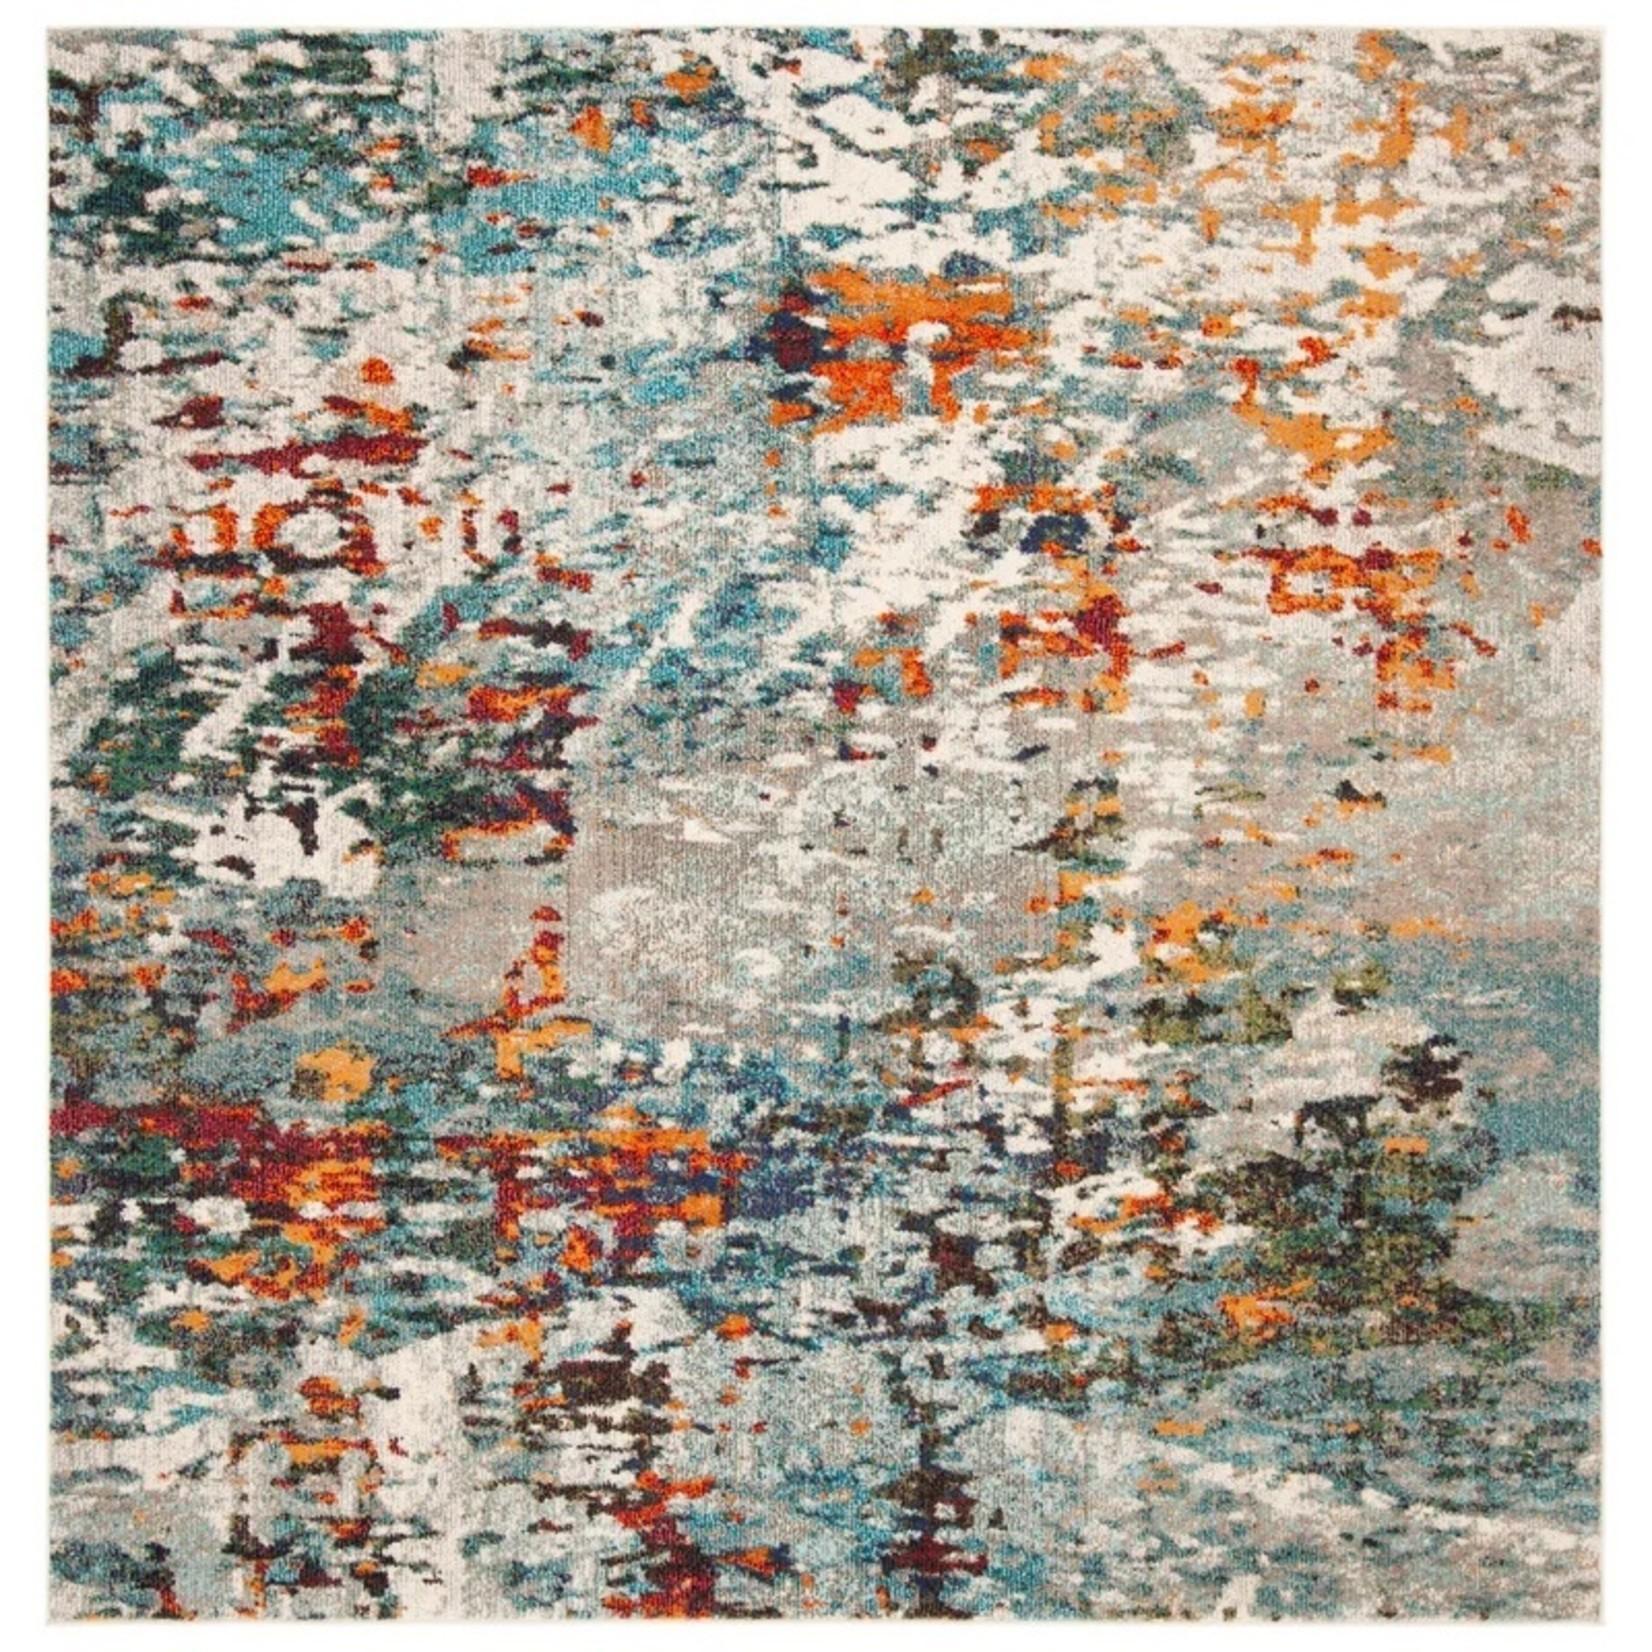 * 5' Square - Neasa Gray/Blue/Orange Rug